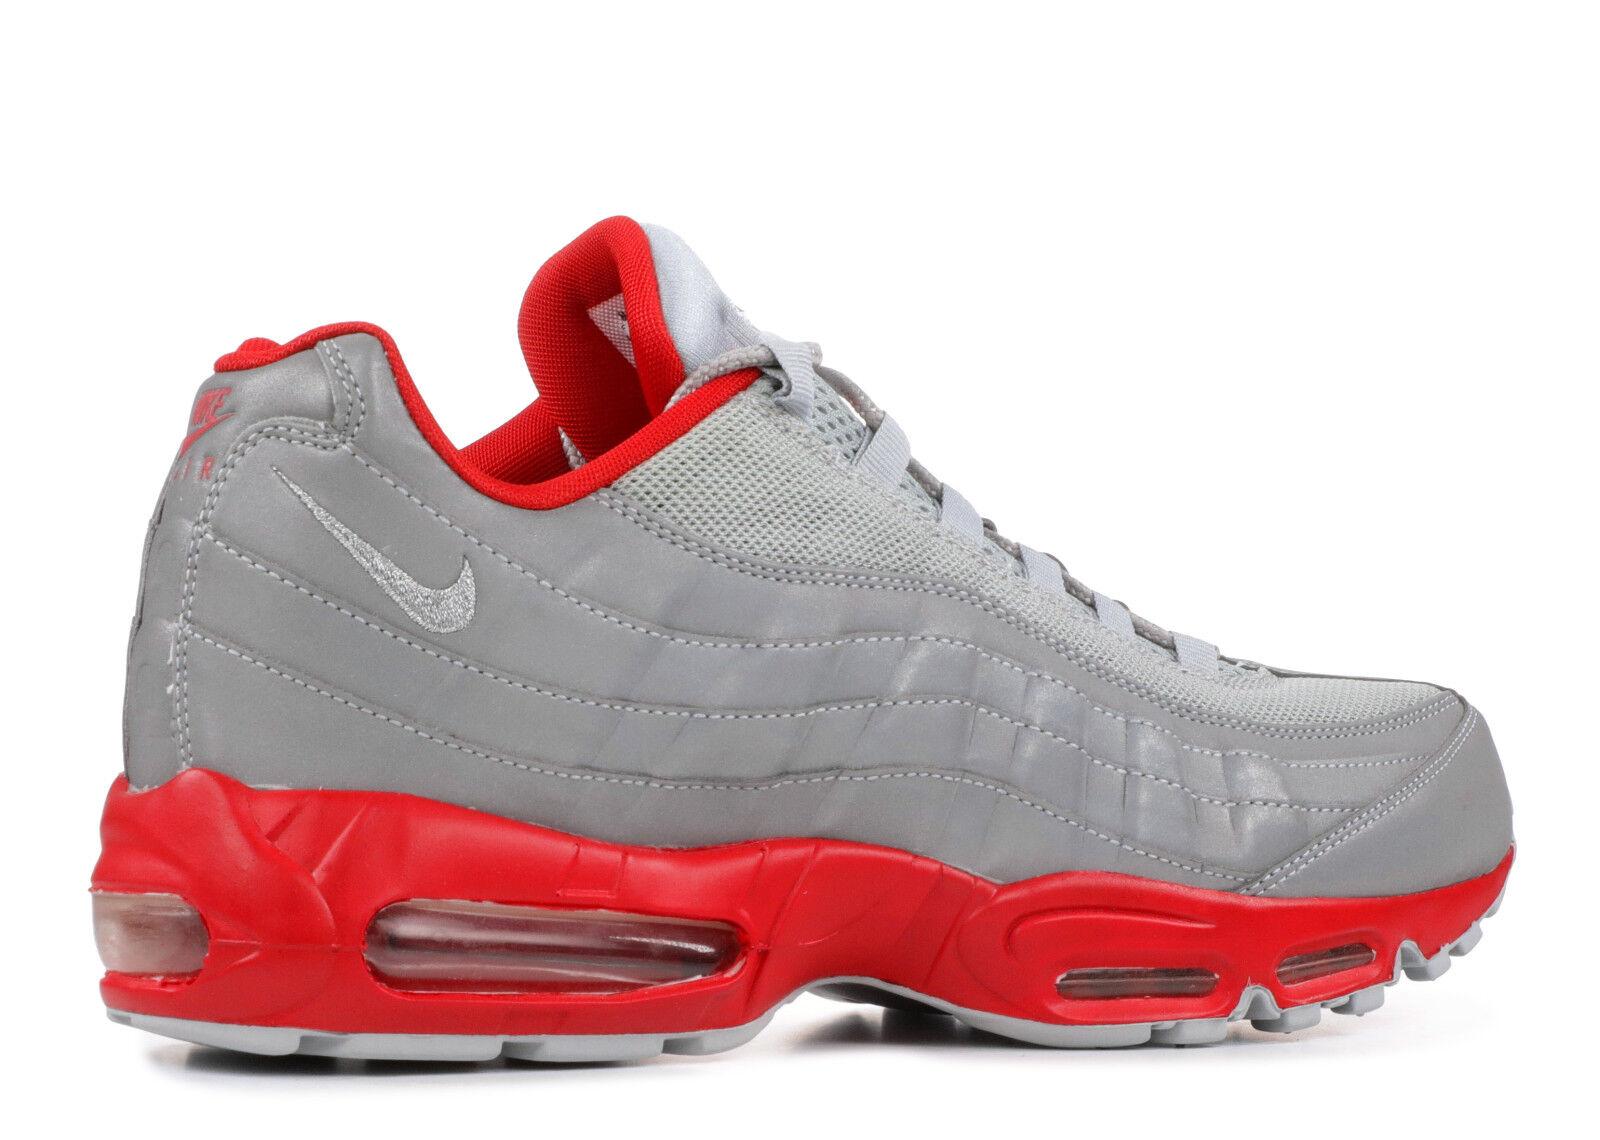 new style 025a5 47489 ... Nike Air Max 95 Metallic Metallic Metallic Silver Sport Red Sz 11  609048-029 2010 ...